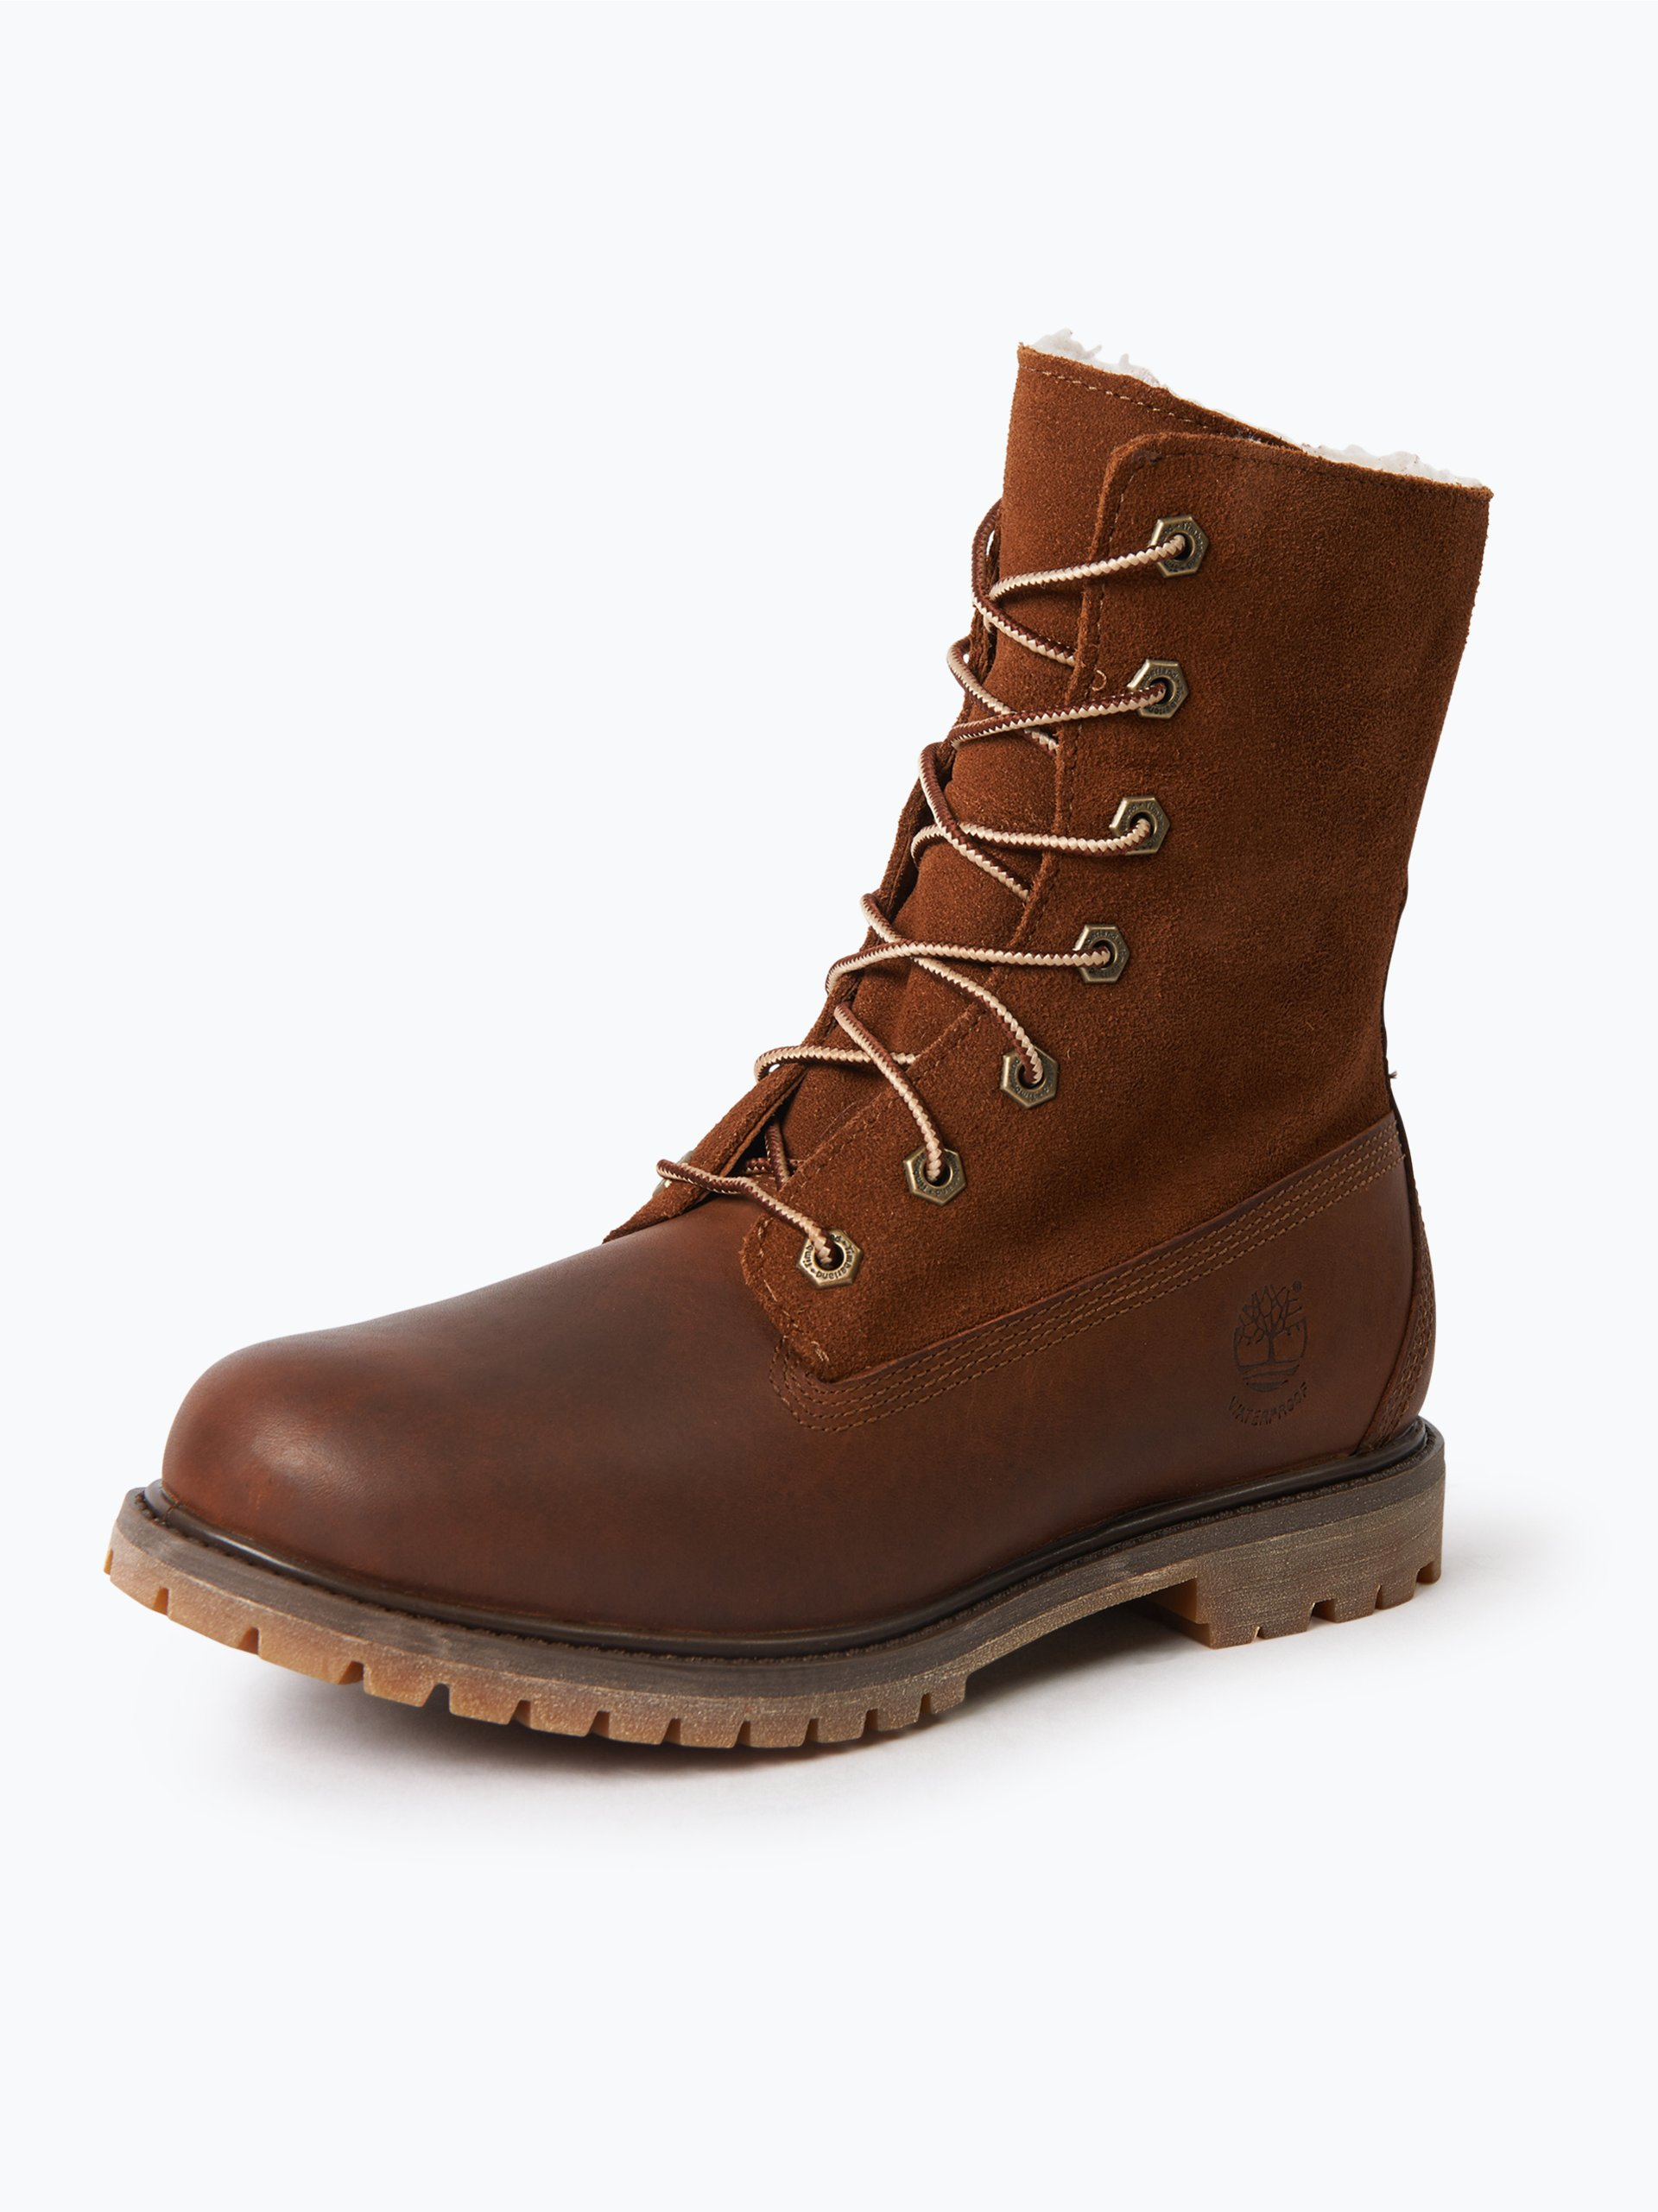 timberland damen boots aus leder braun uni online kaufen. Black Bedroom Furniture Sets. Home Design Ideas